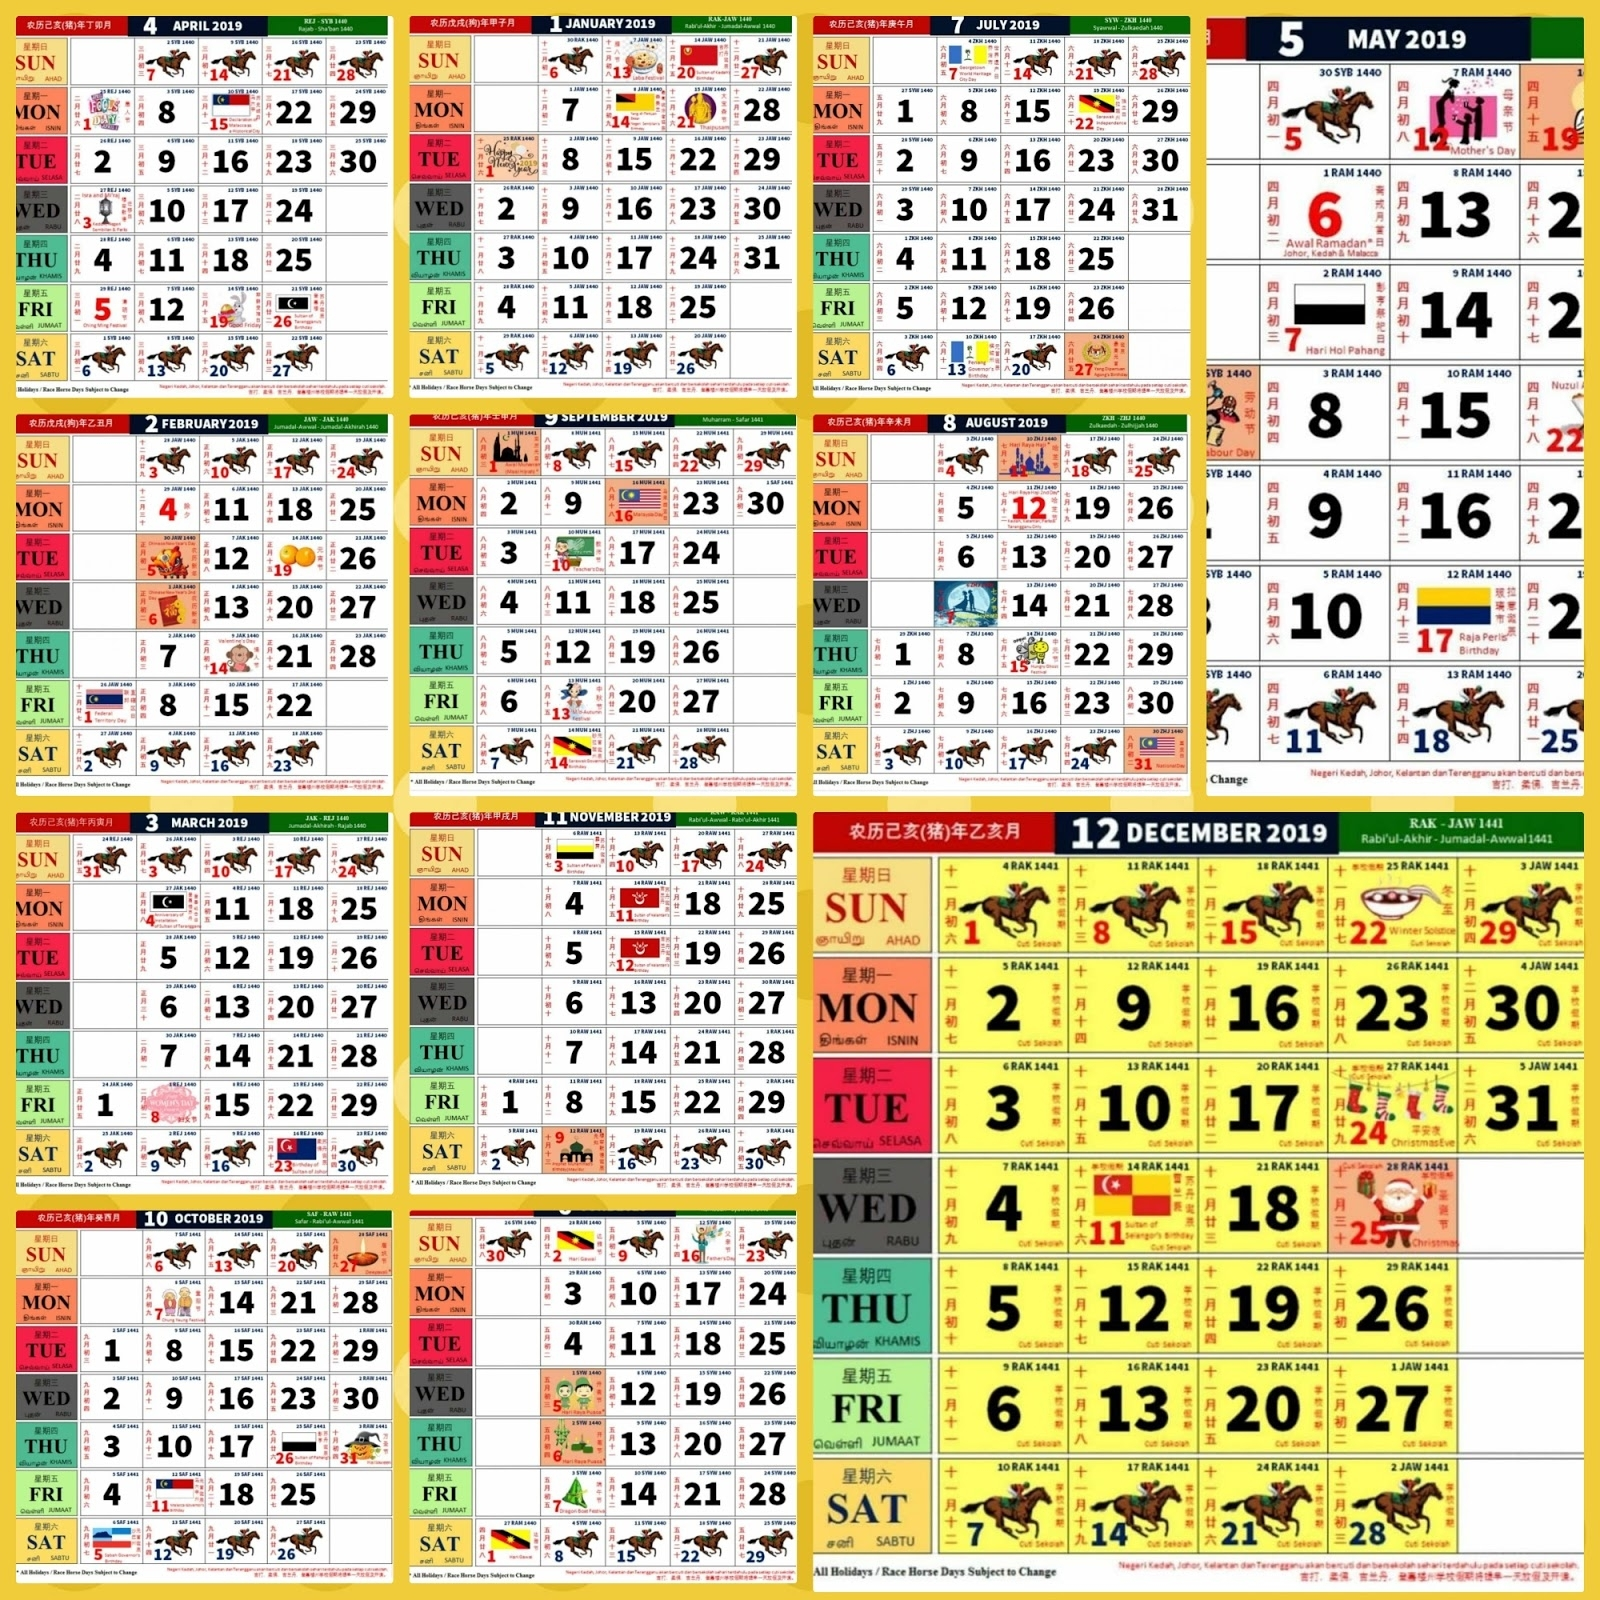 Kalendar Kuda 2019 | 2018 Calendar Printable For Free for Calendar 2020 Free Printable Kuda